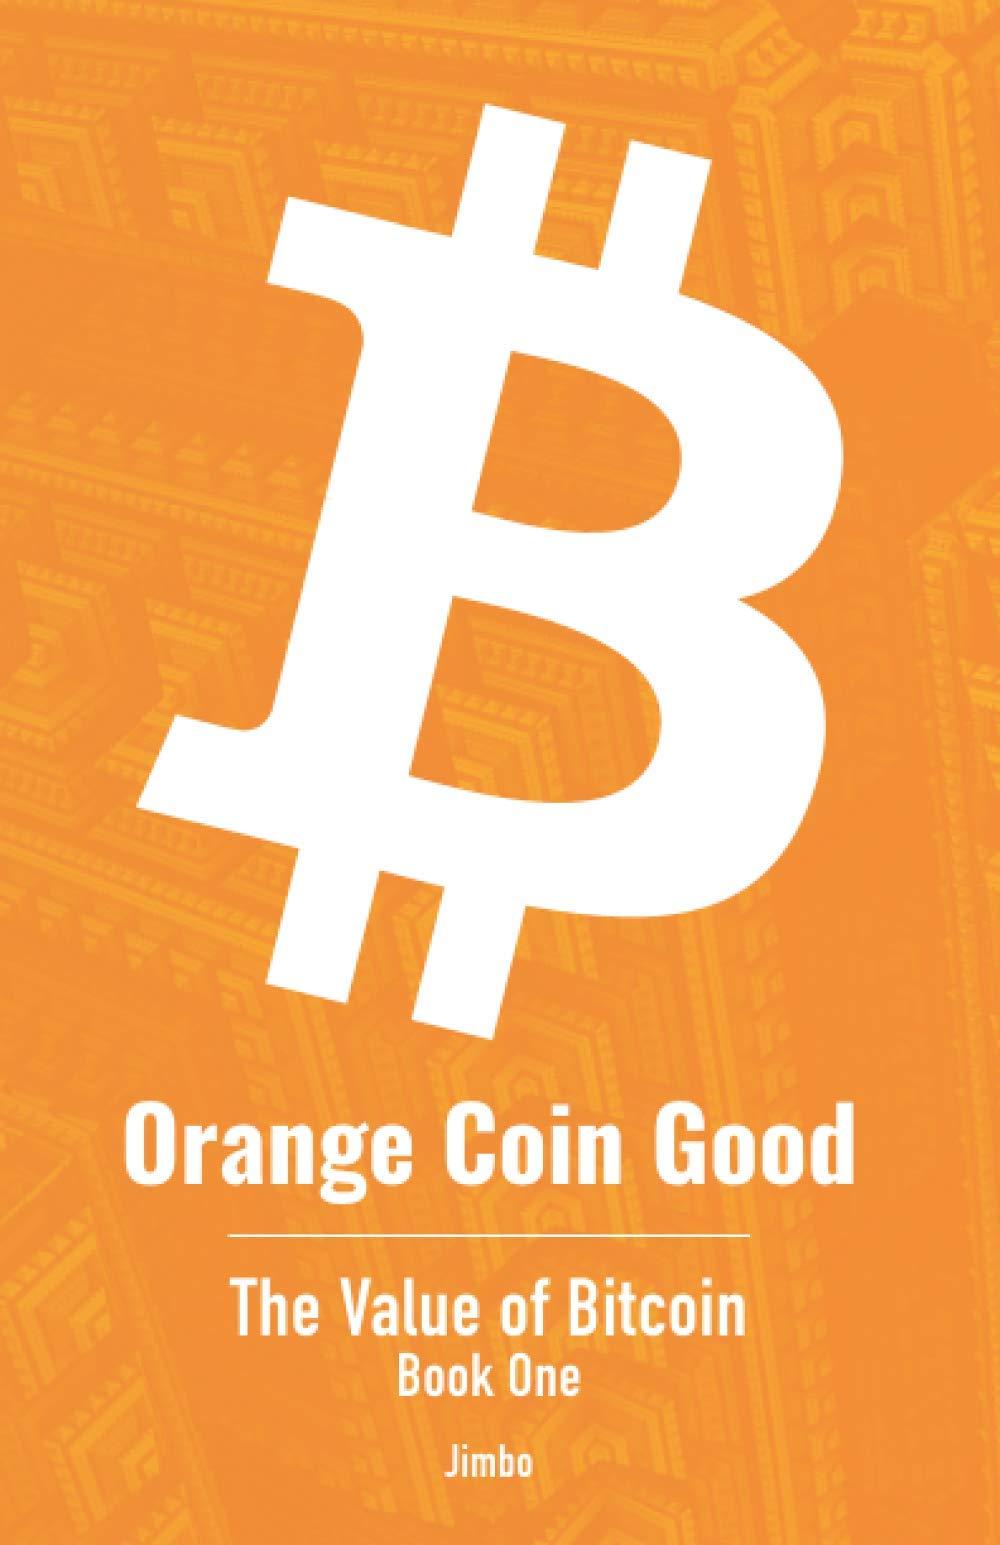 bitcoin de tranzacționare semnificație crypto robot recenzii